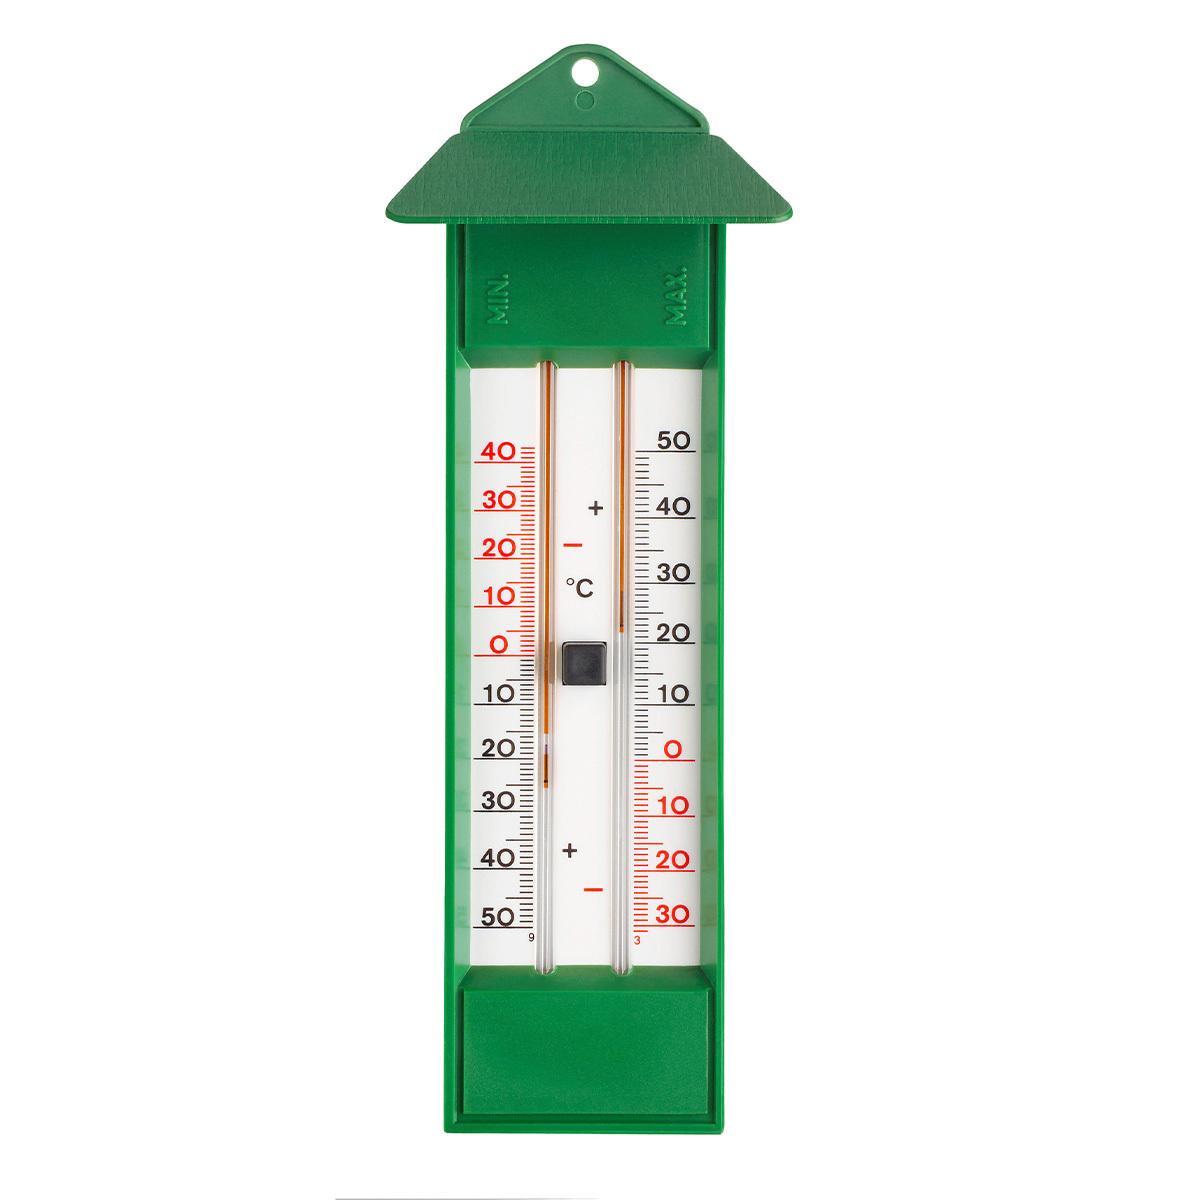 10-3015-04-analoges-minima-maxima-thermometer-1200x1200px.jpg